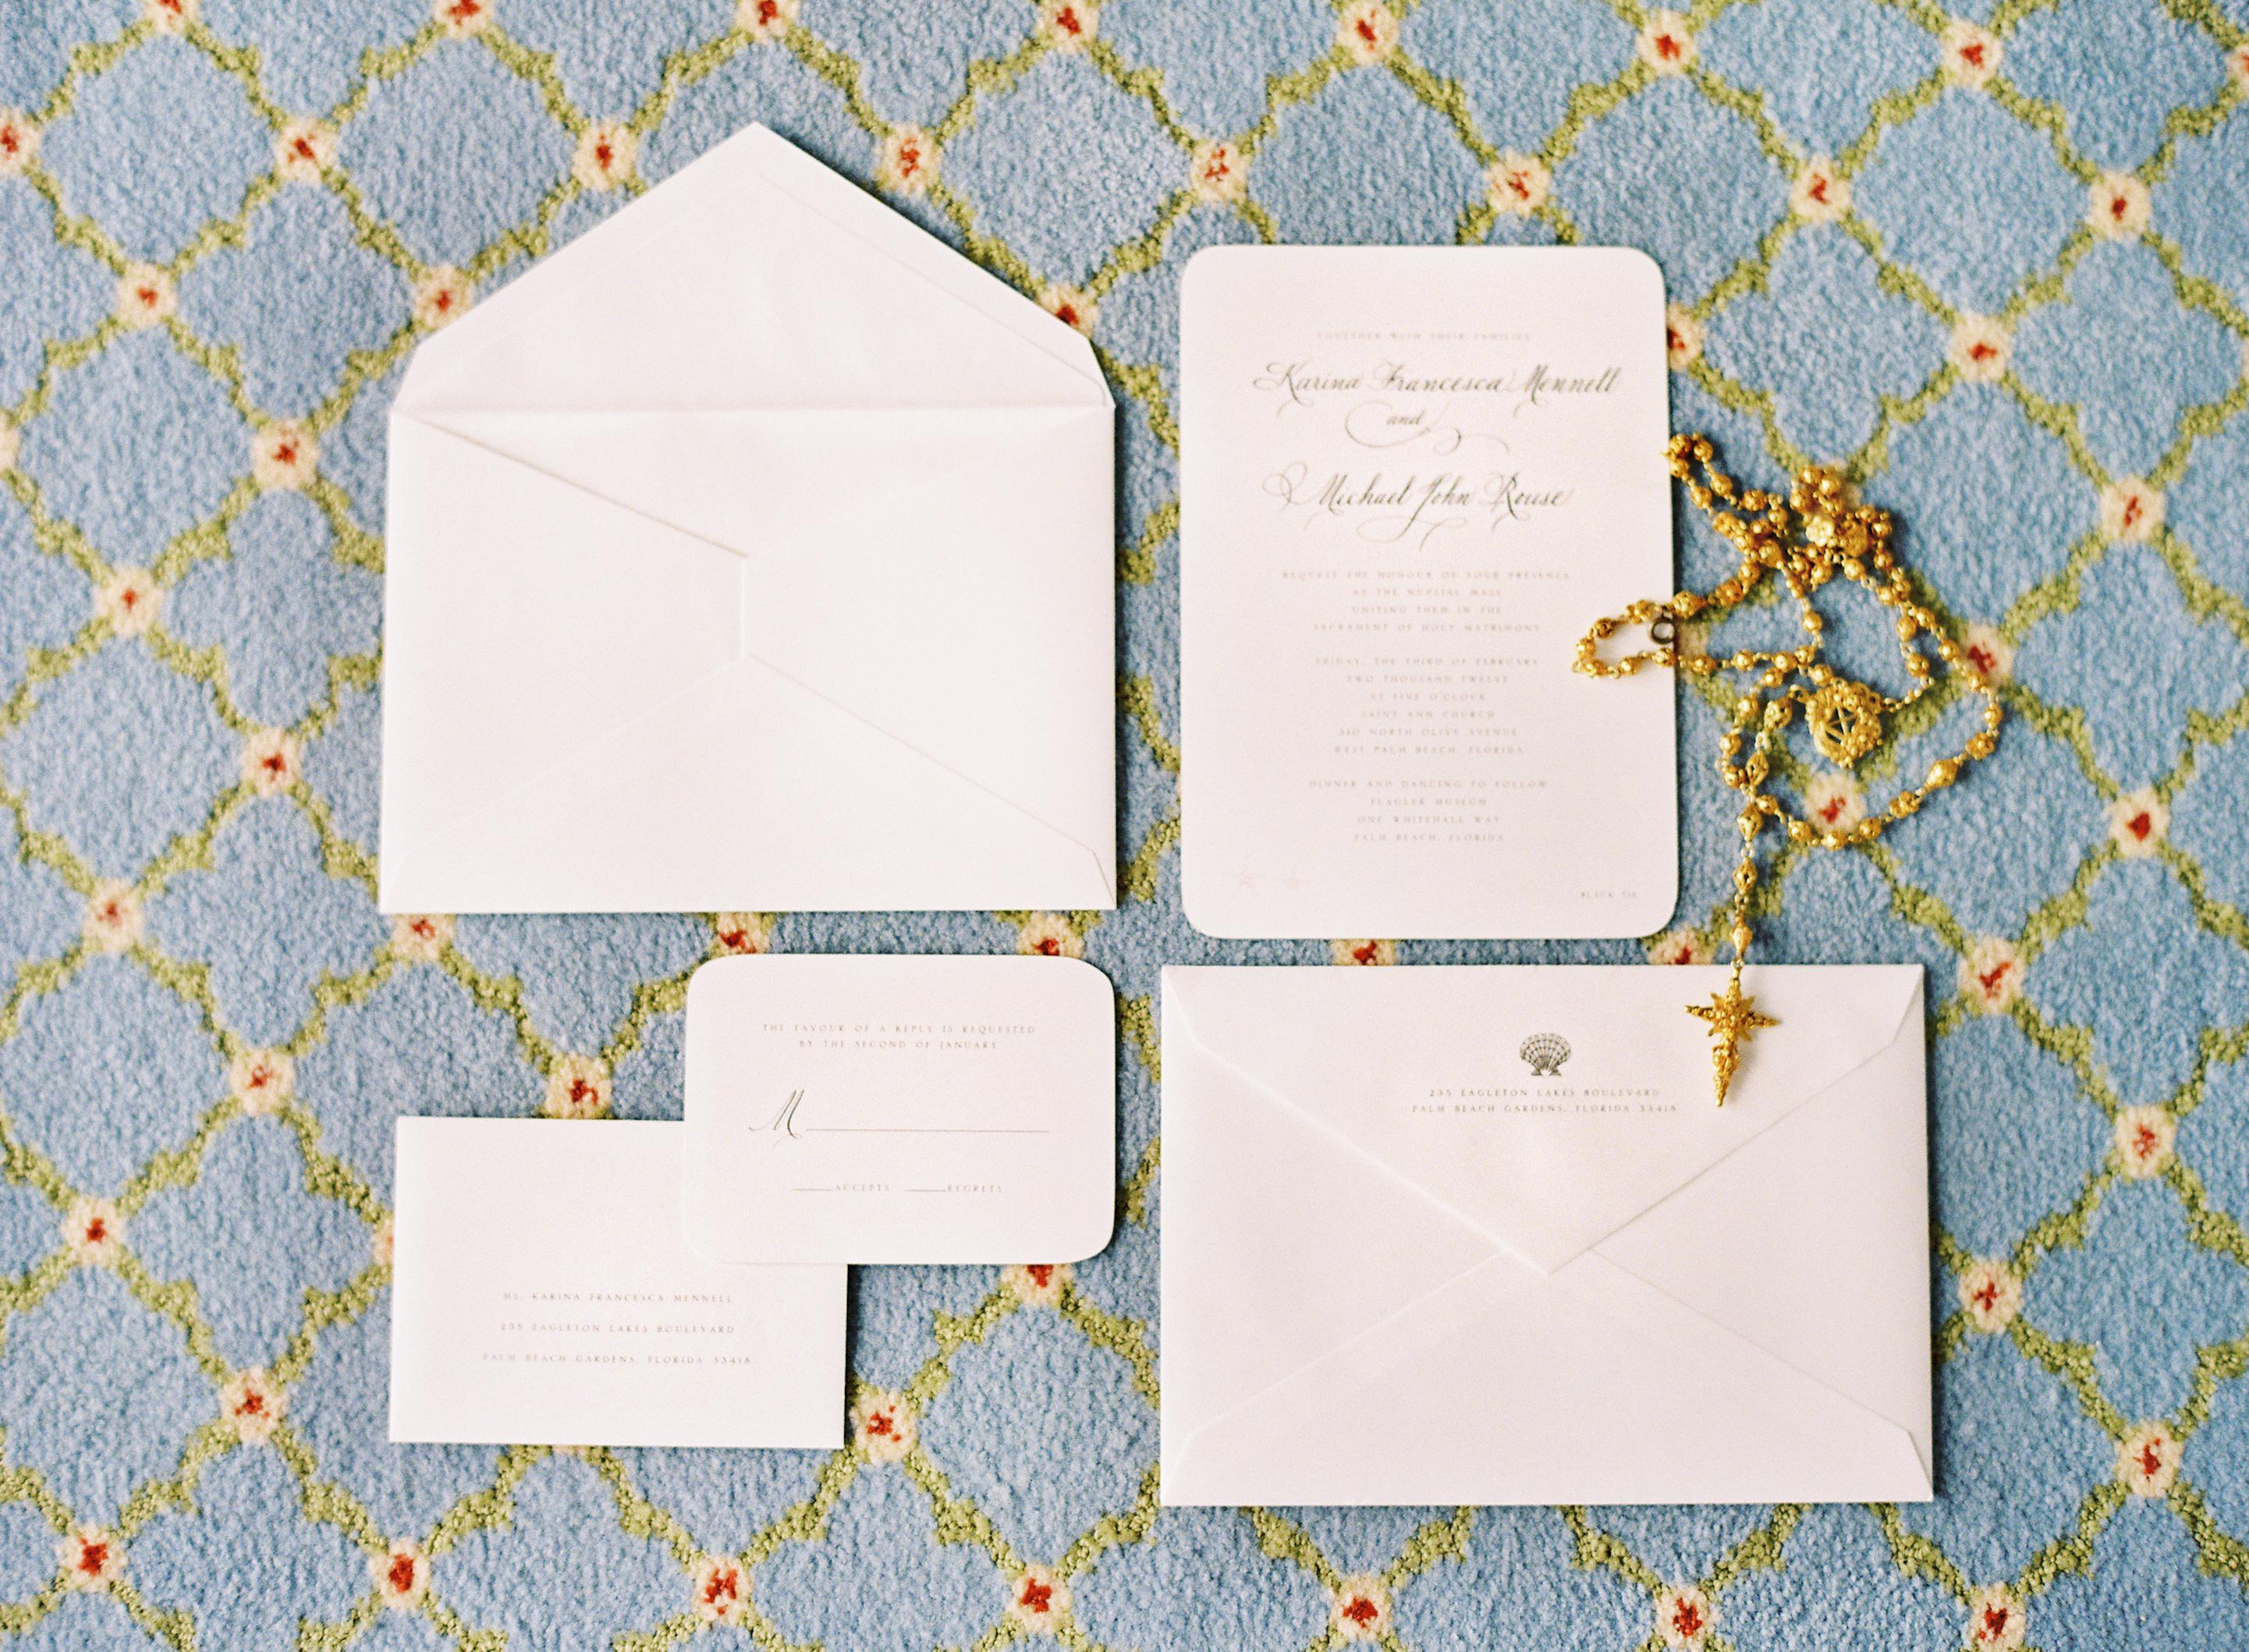 Calligraphy, Stationery, white, Invitations, Shells, Karina mike